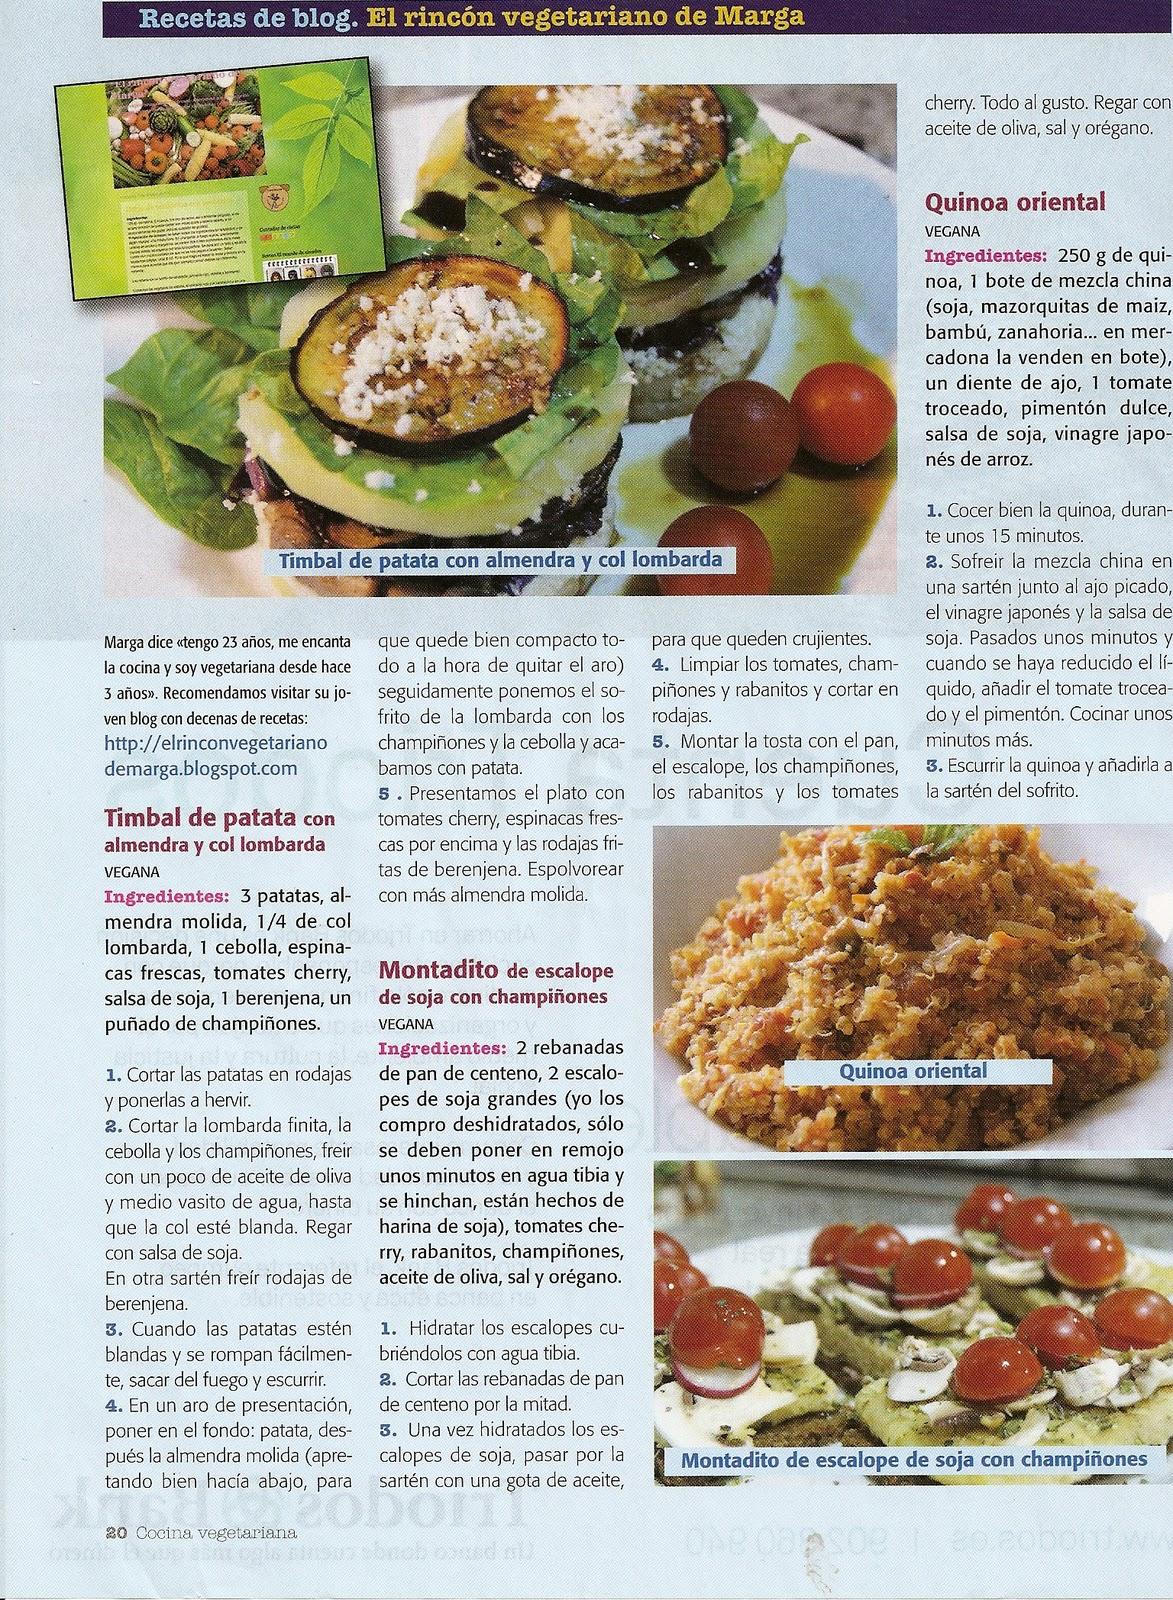 Publicaci n de mi blog en revista 39 cocina vegetariana for Blogs cocina vegetariana